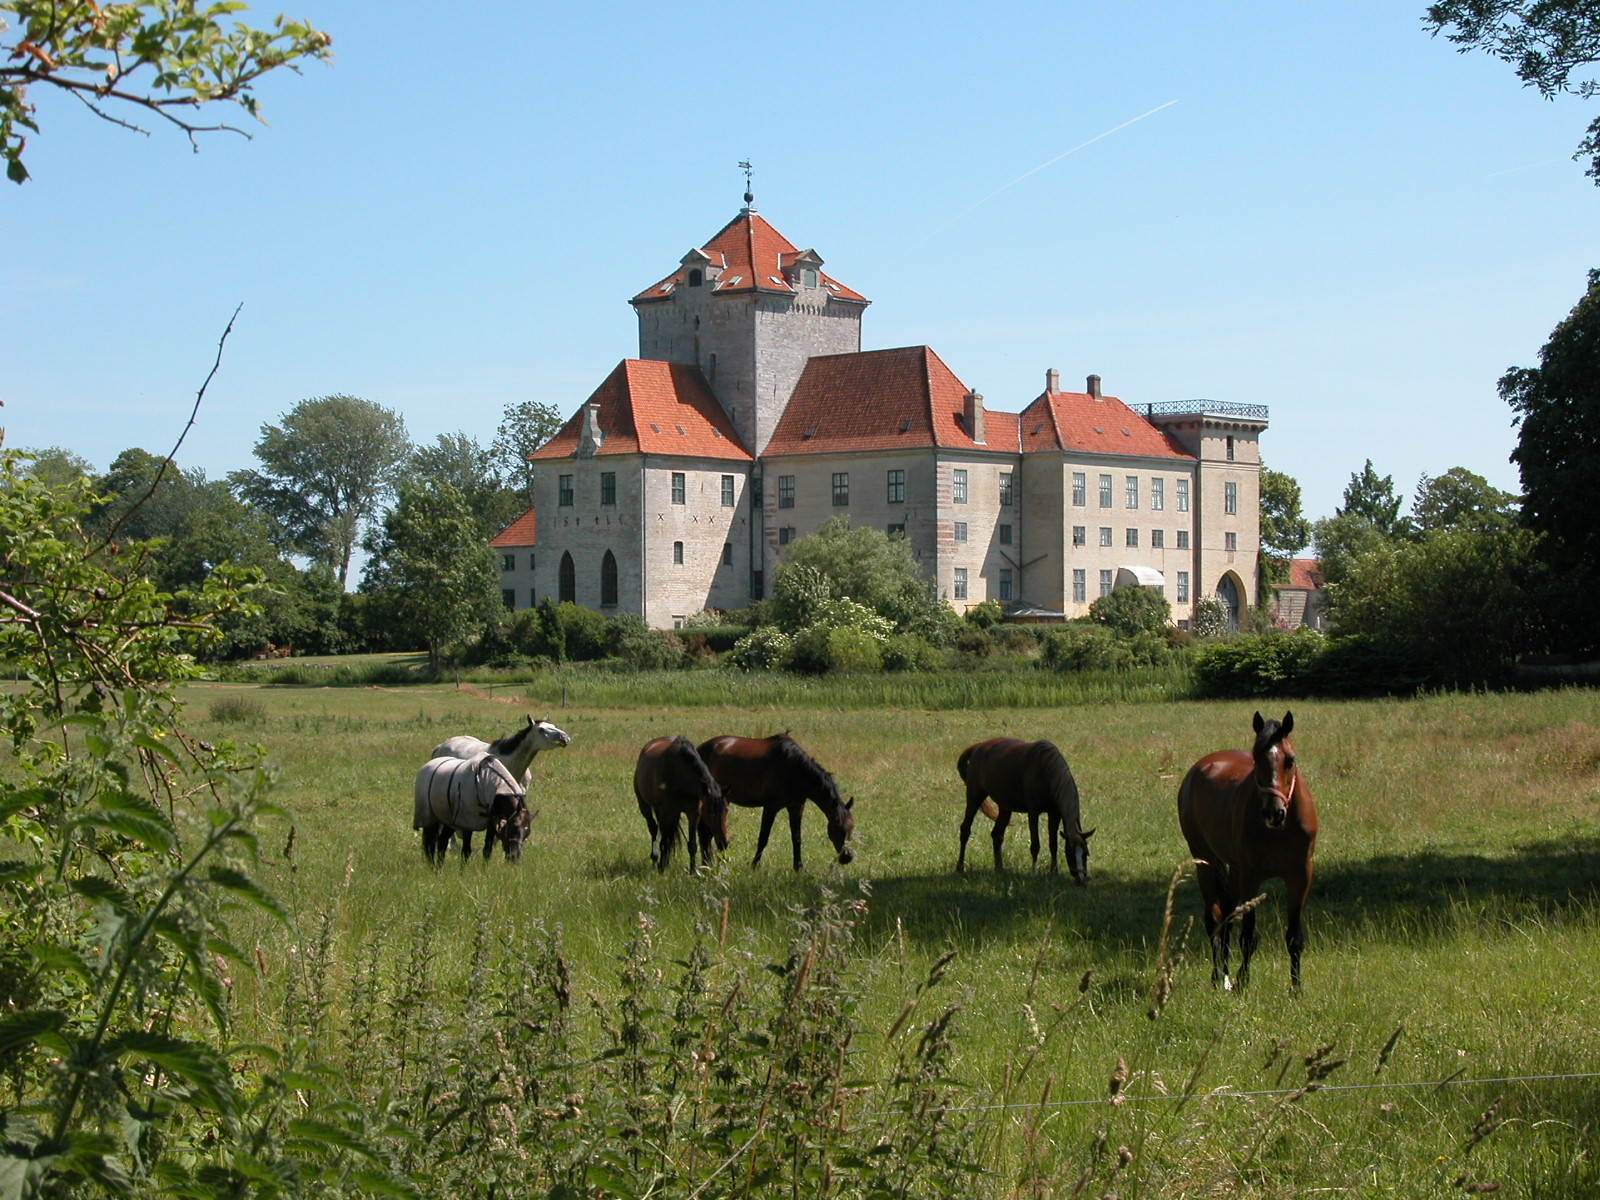 Gjorslev slot 2007